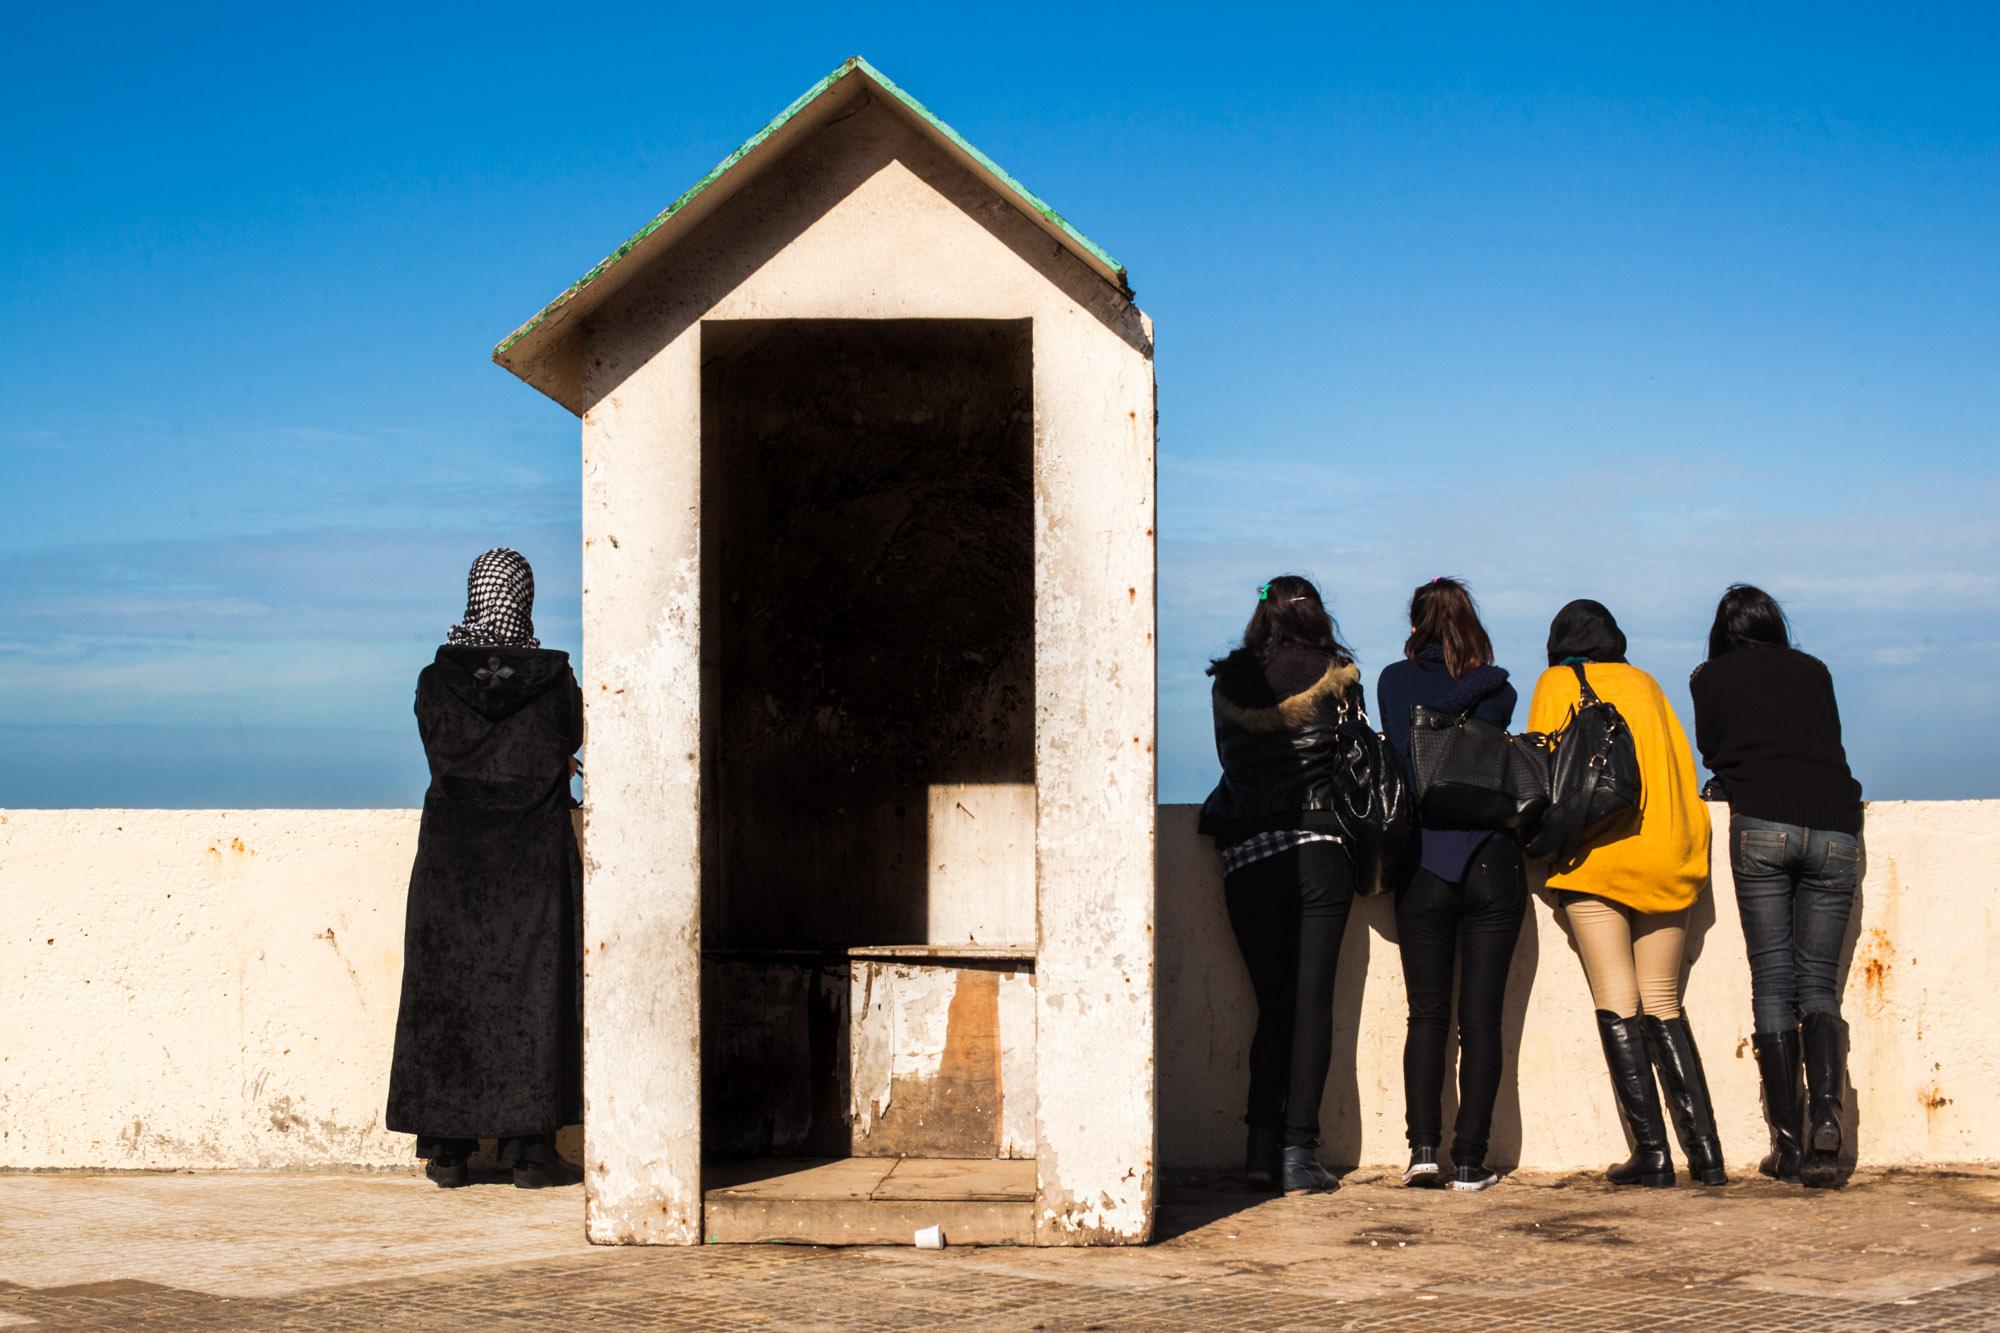 Crédit Photo :  Yoriyas  - Yassine Alaoui ismaili